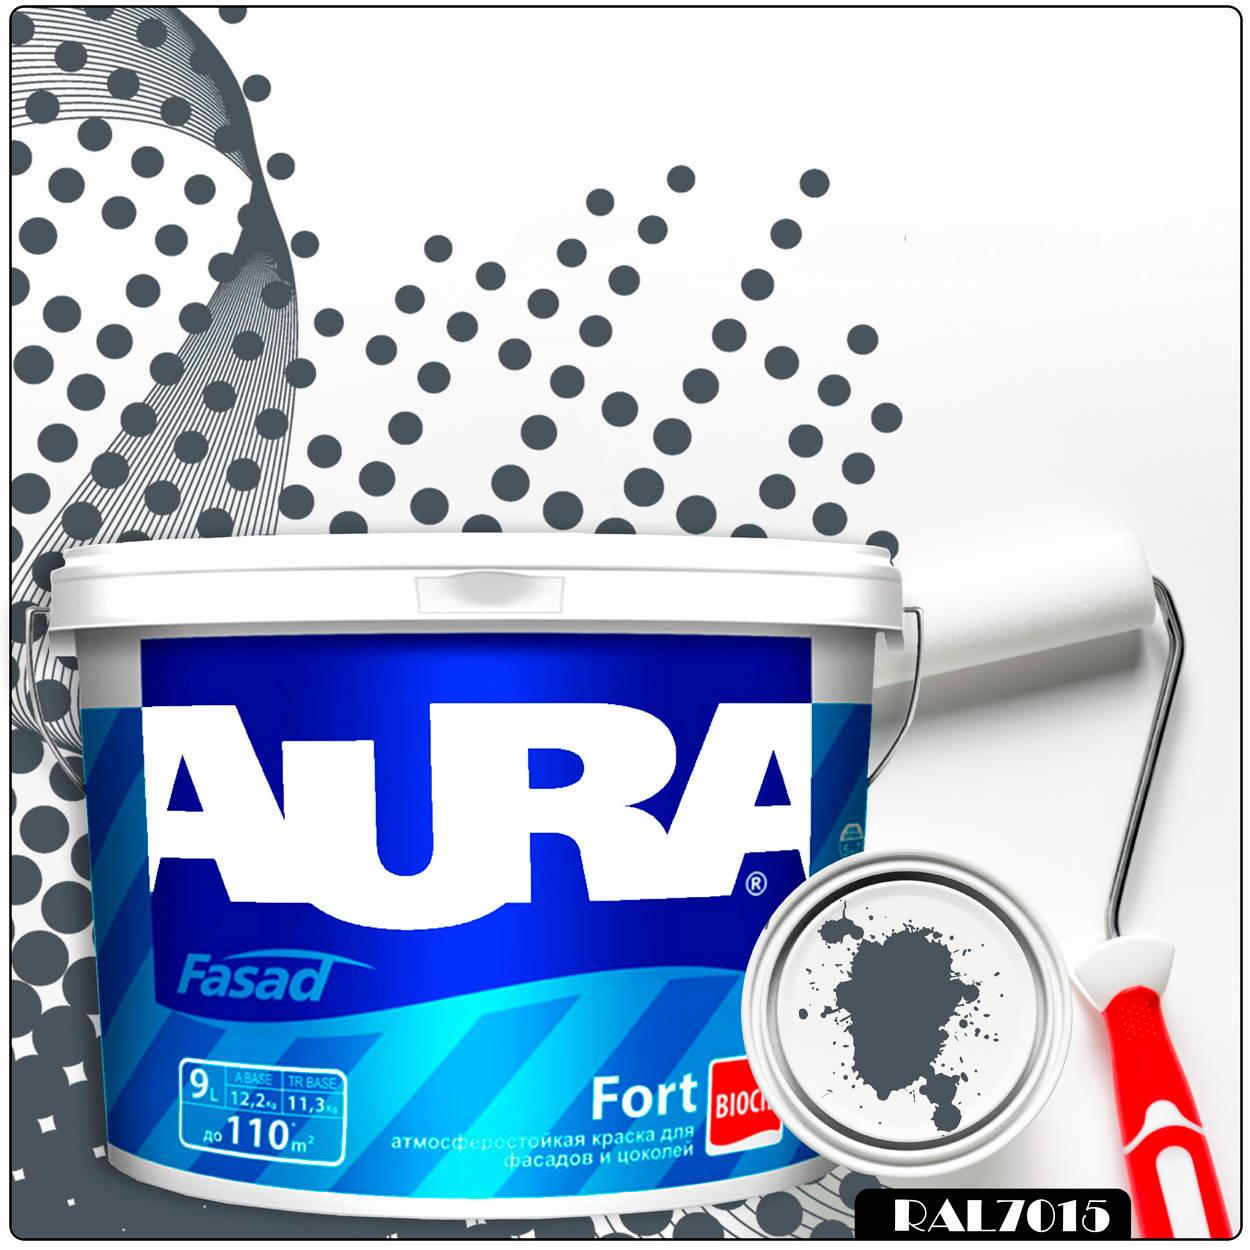 Фото 13 - Краска Aura Fasad Fort, RAL 7015 Серый сланец, латексная, матовая, для фасада и цоколей, 9л, Аура.